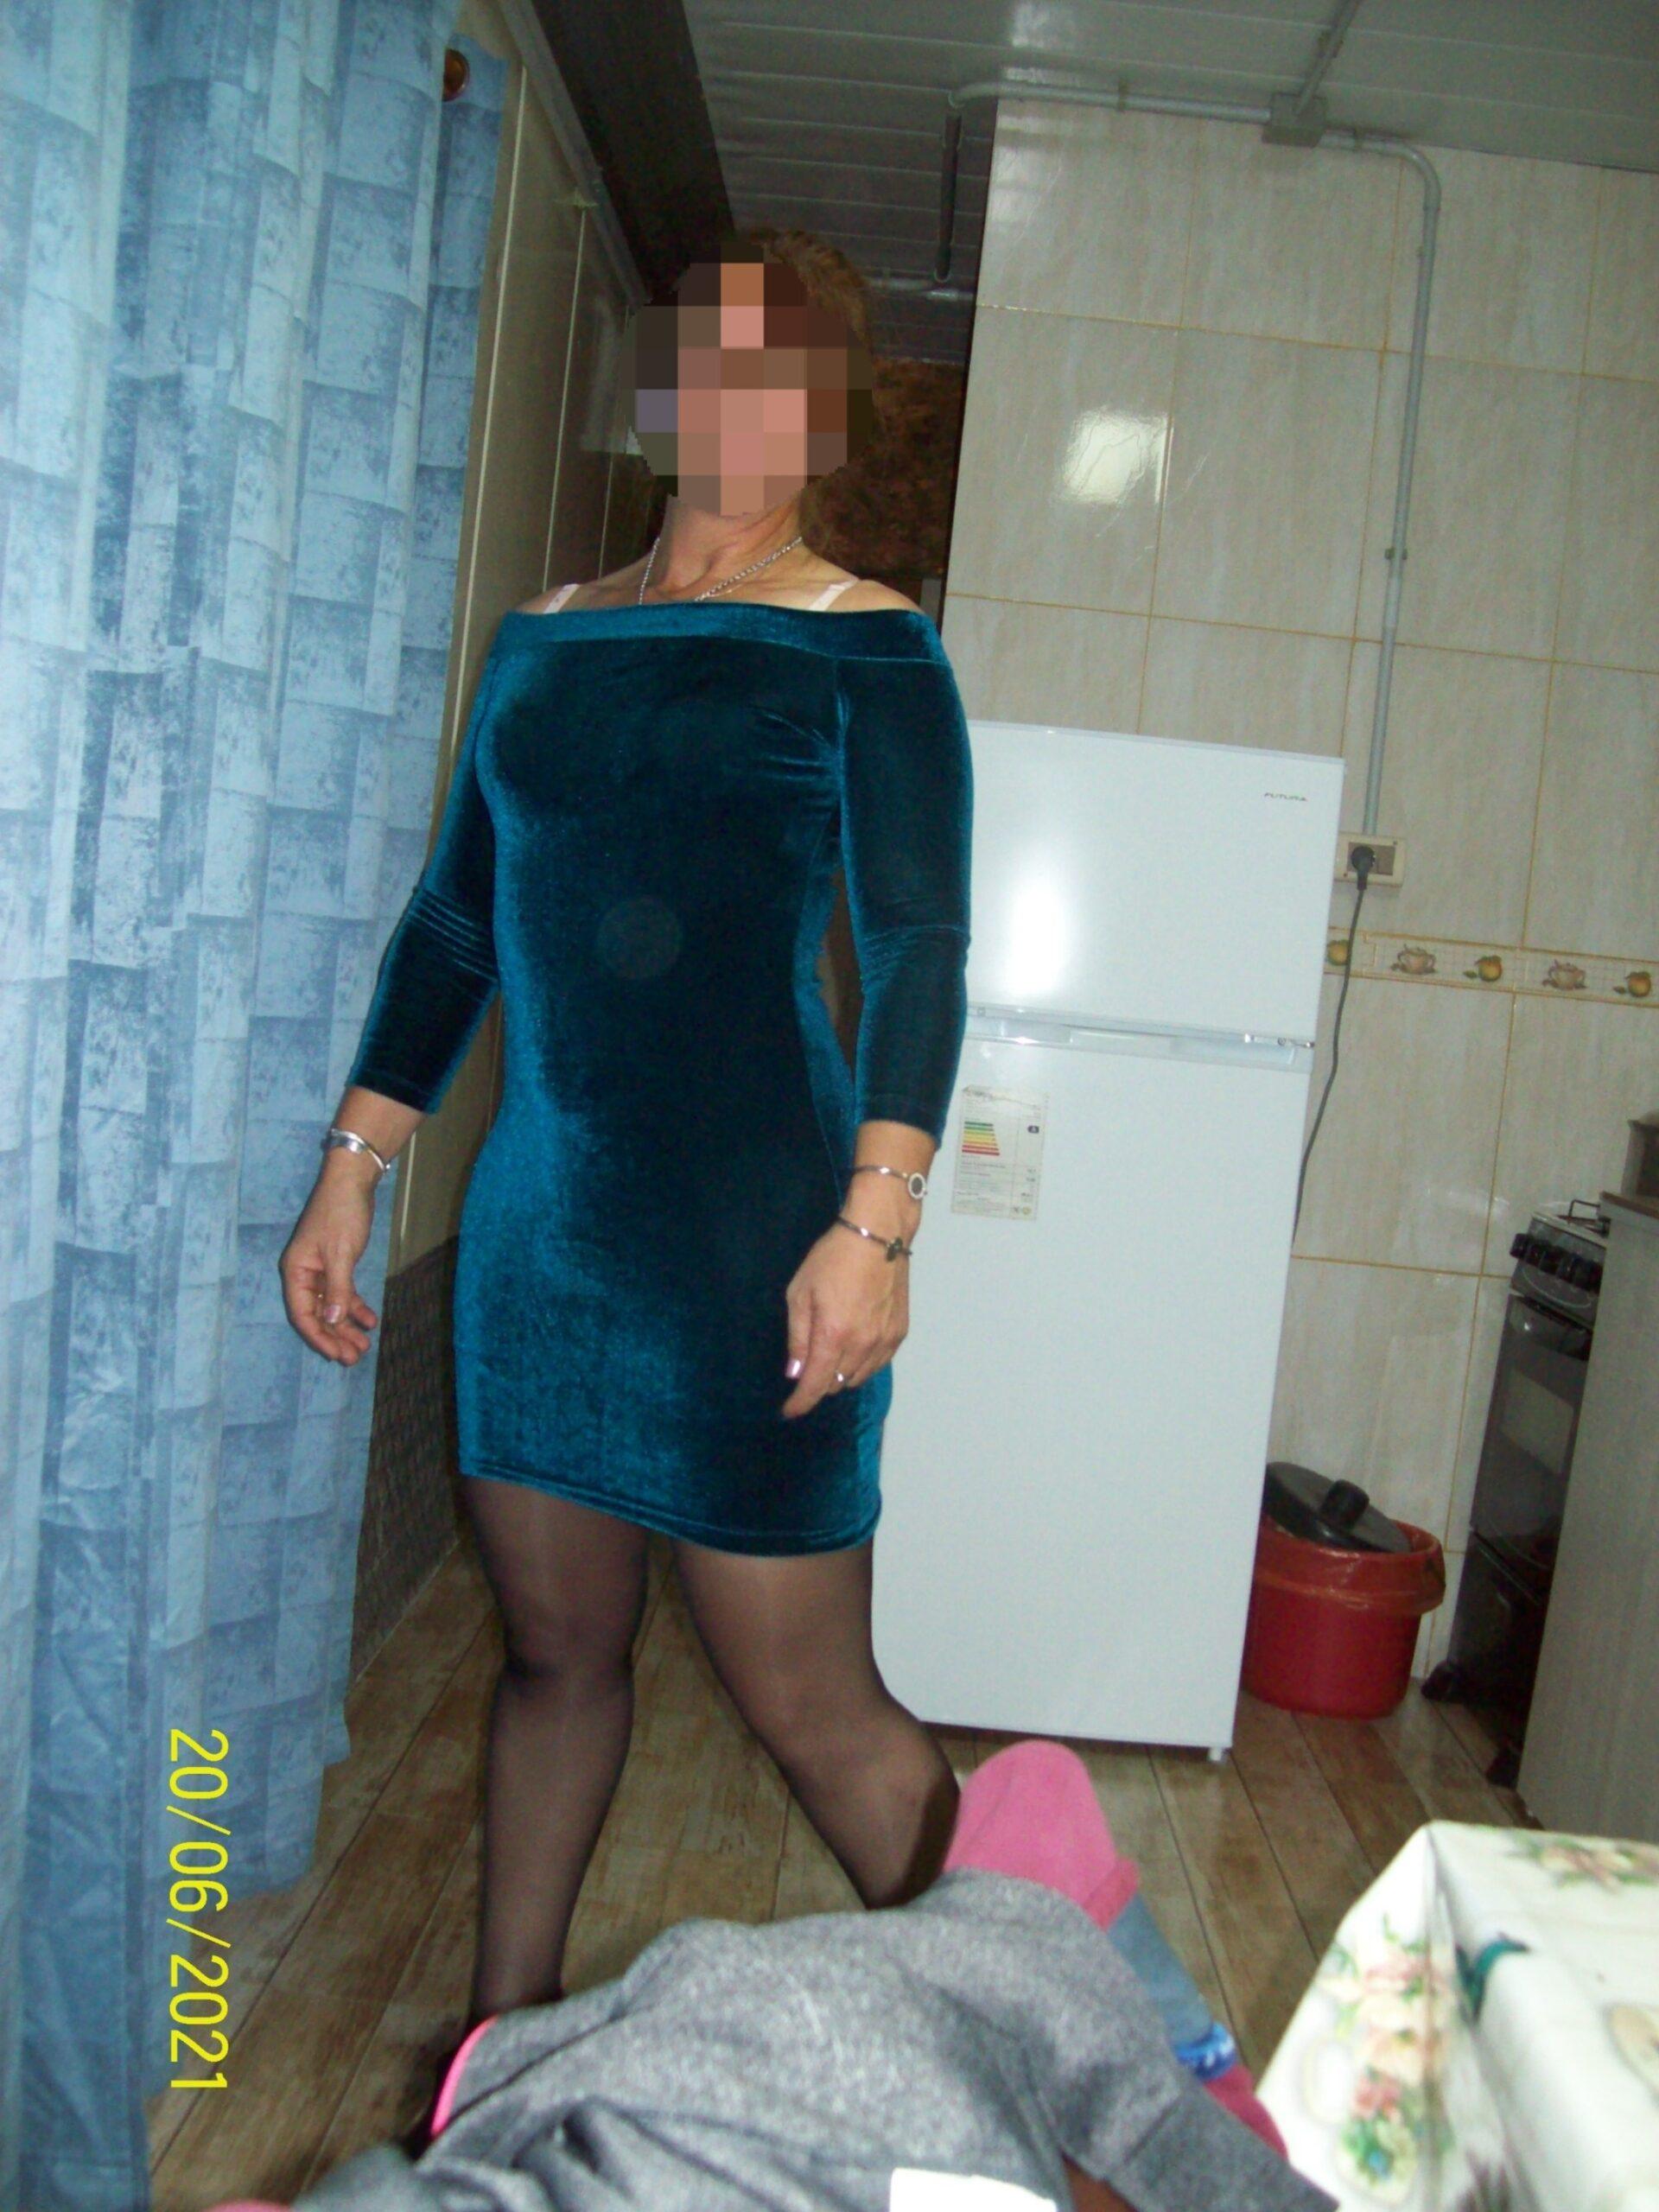 fotos esposas guarras, fotos xxx milfs, mujeres maduras, calientes